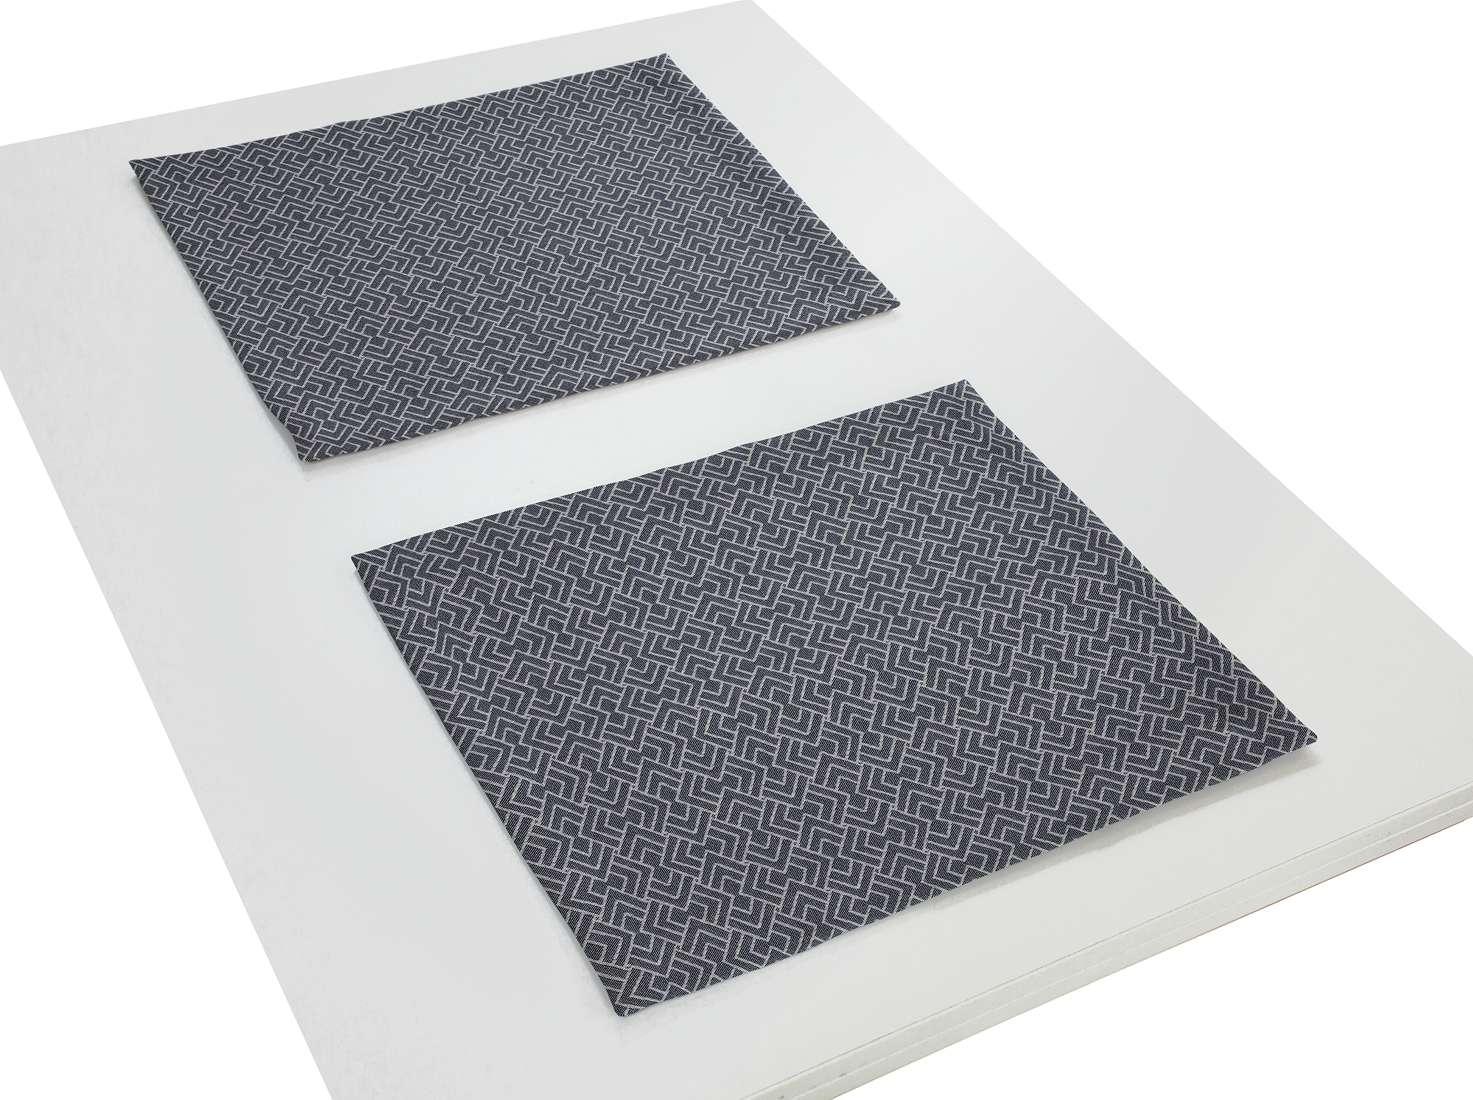 Graphic Ventus light (Tischsets)